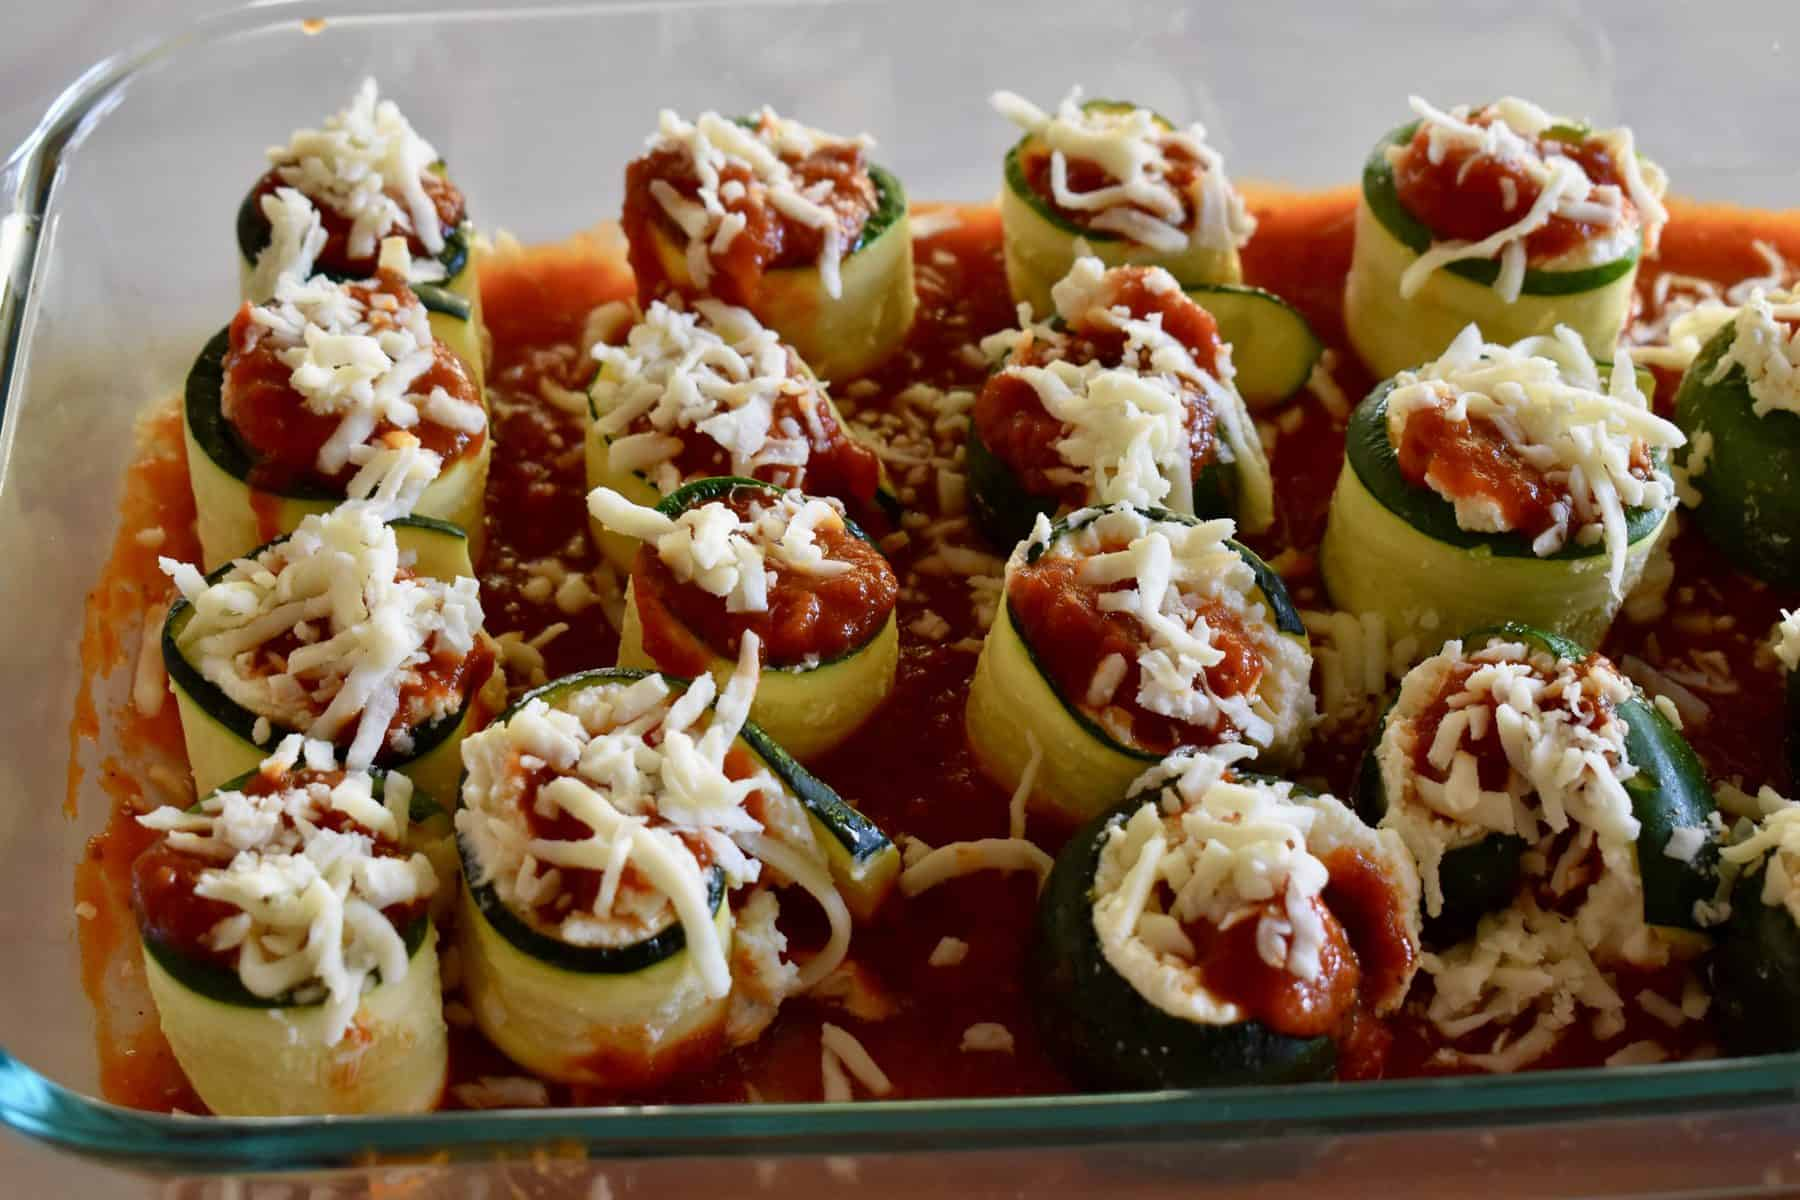 Zucchini rolls ups in a pan of marinara sauce.